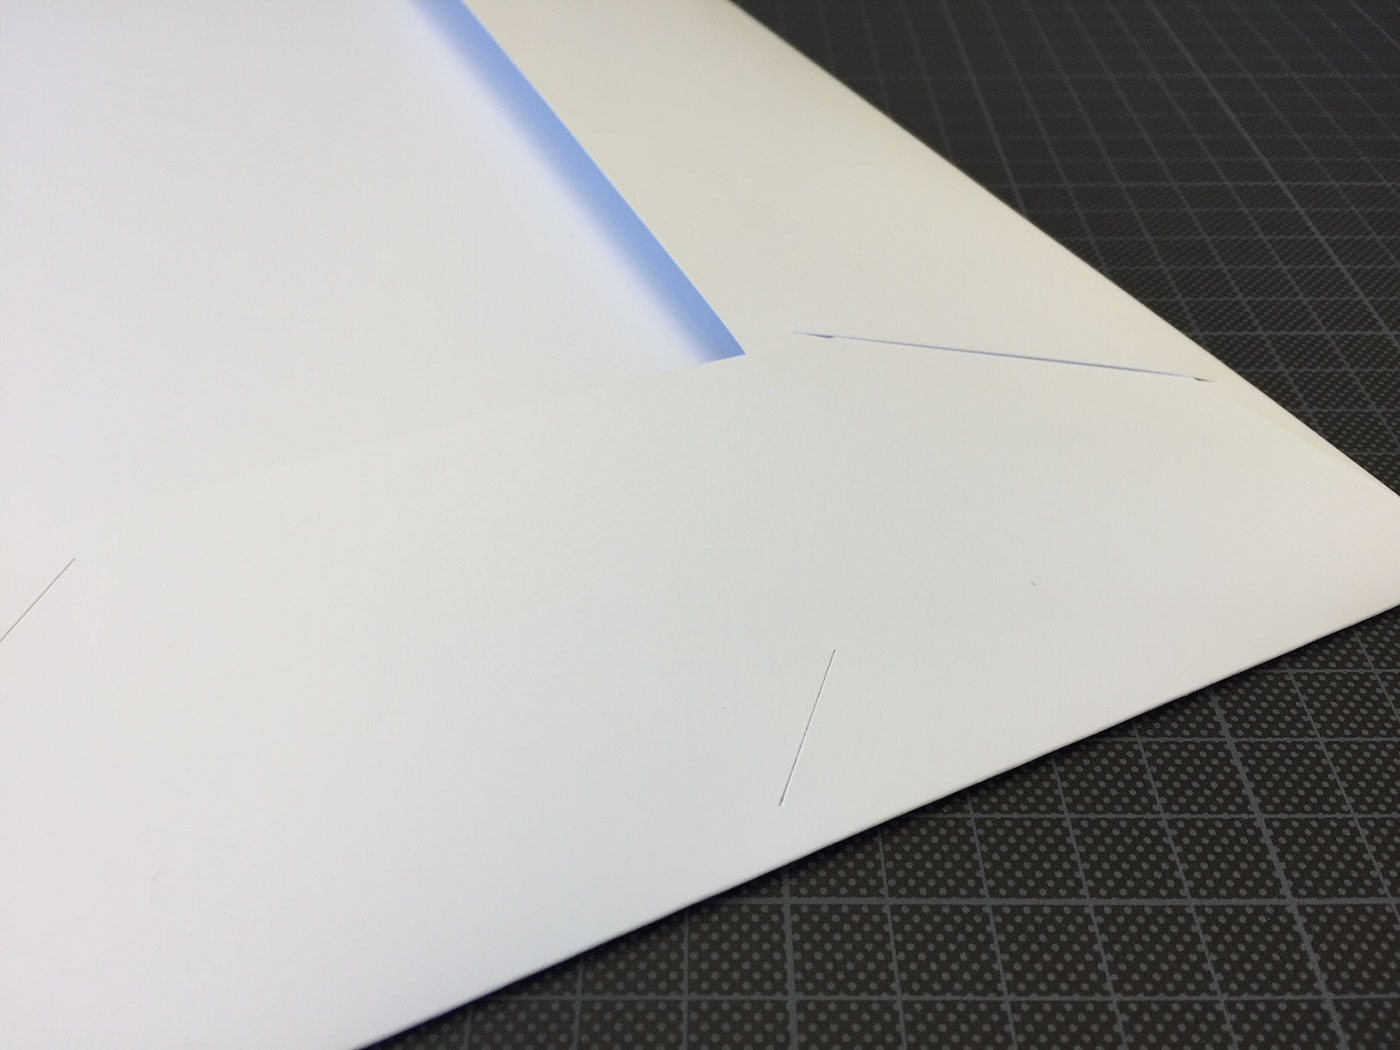 Mappen (Präsentation-, Image-)